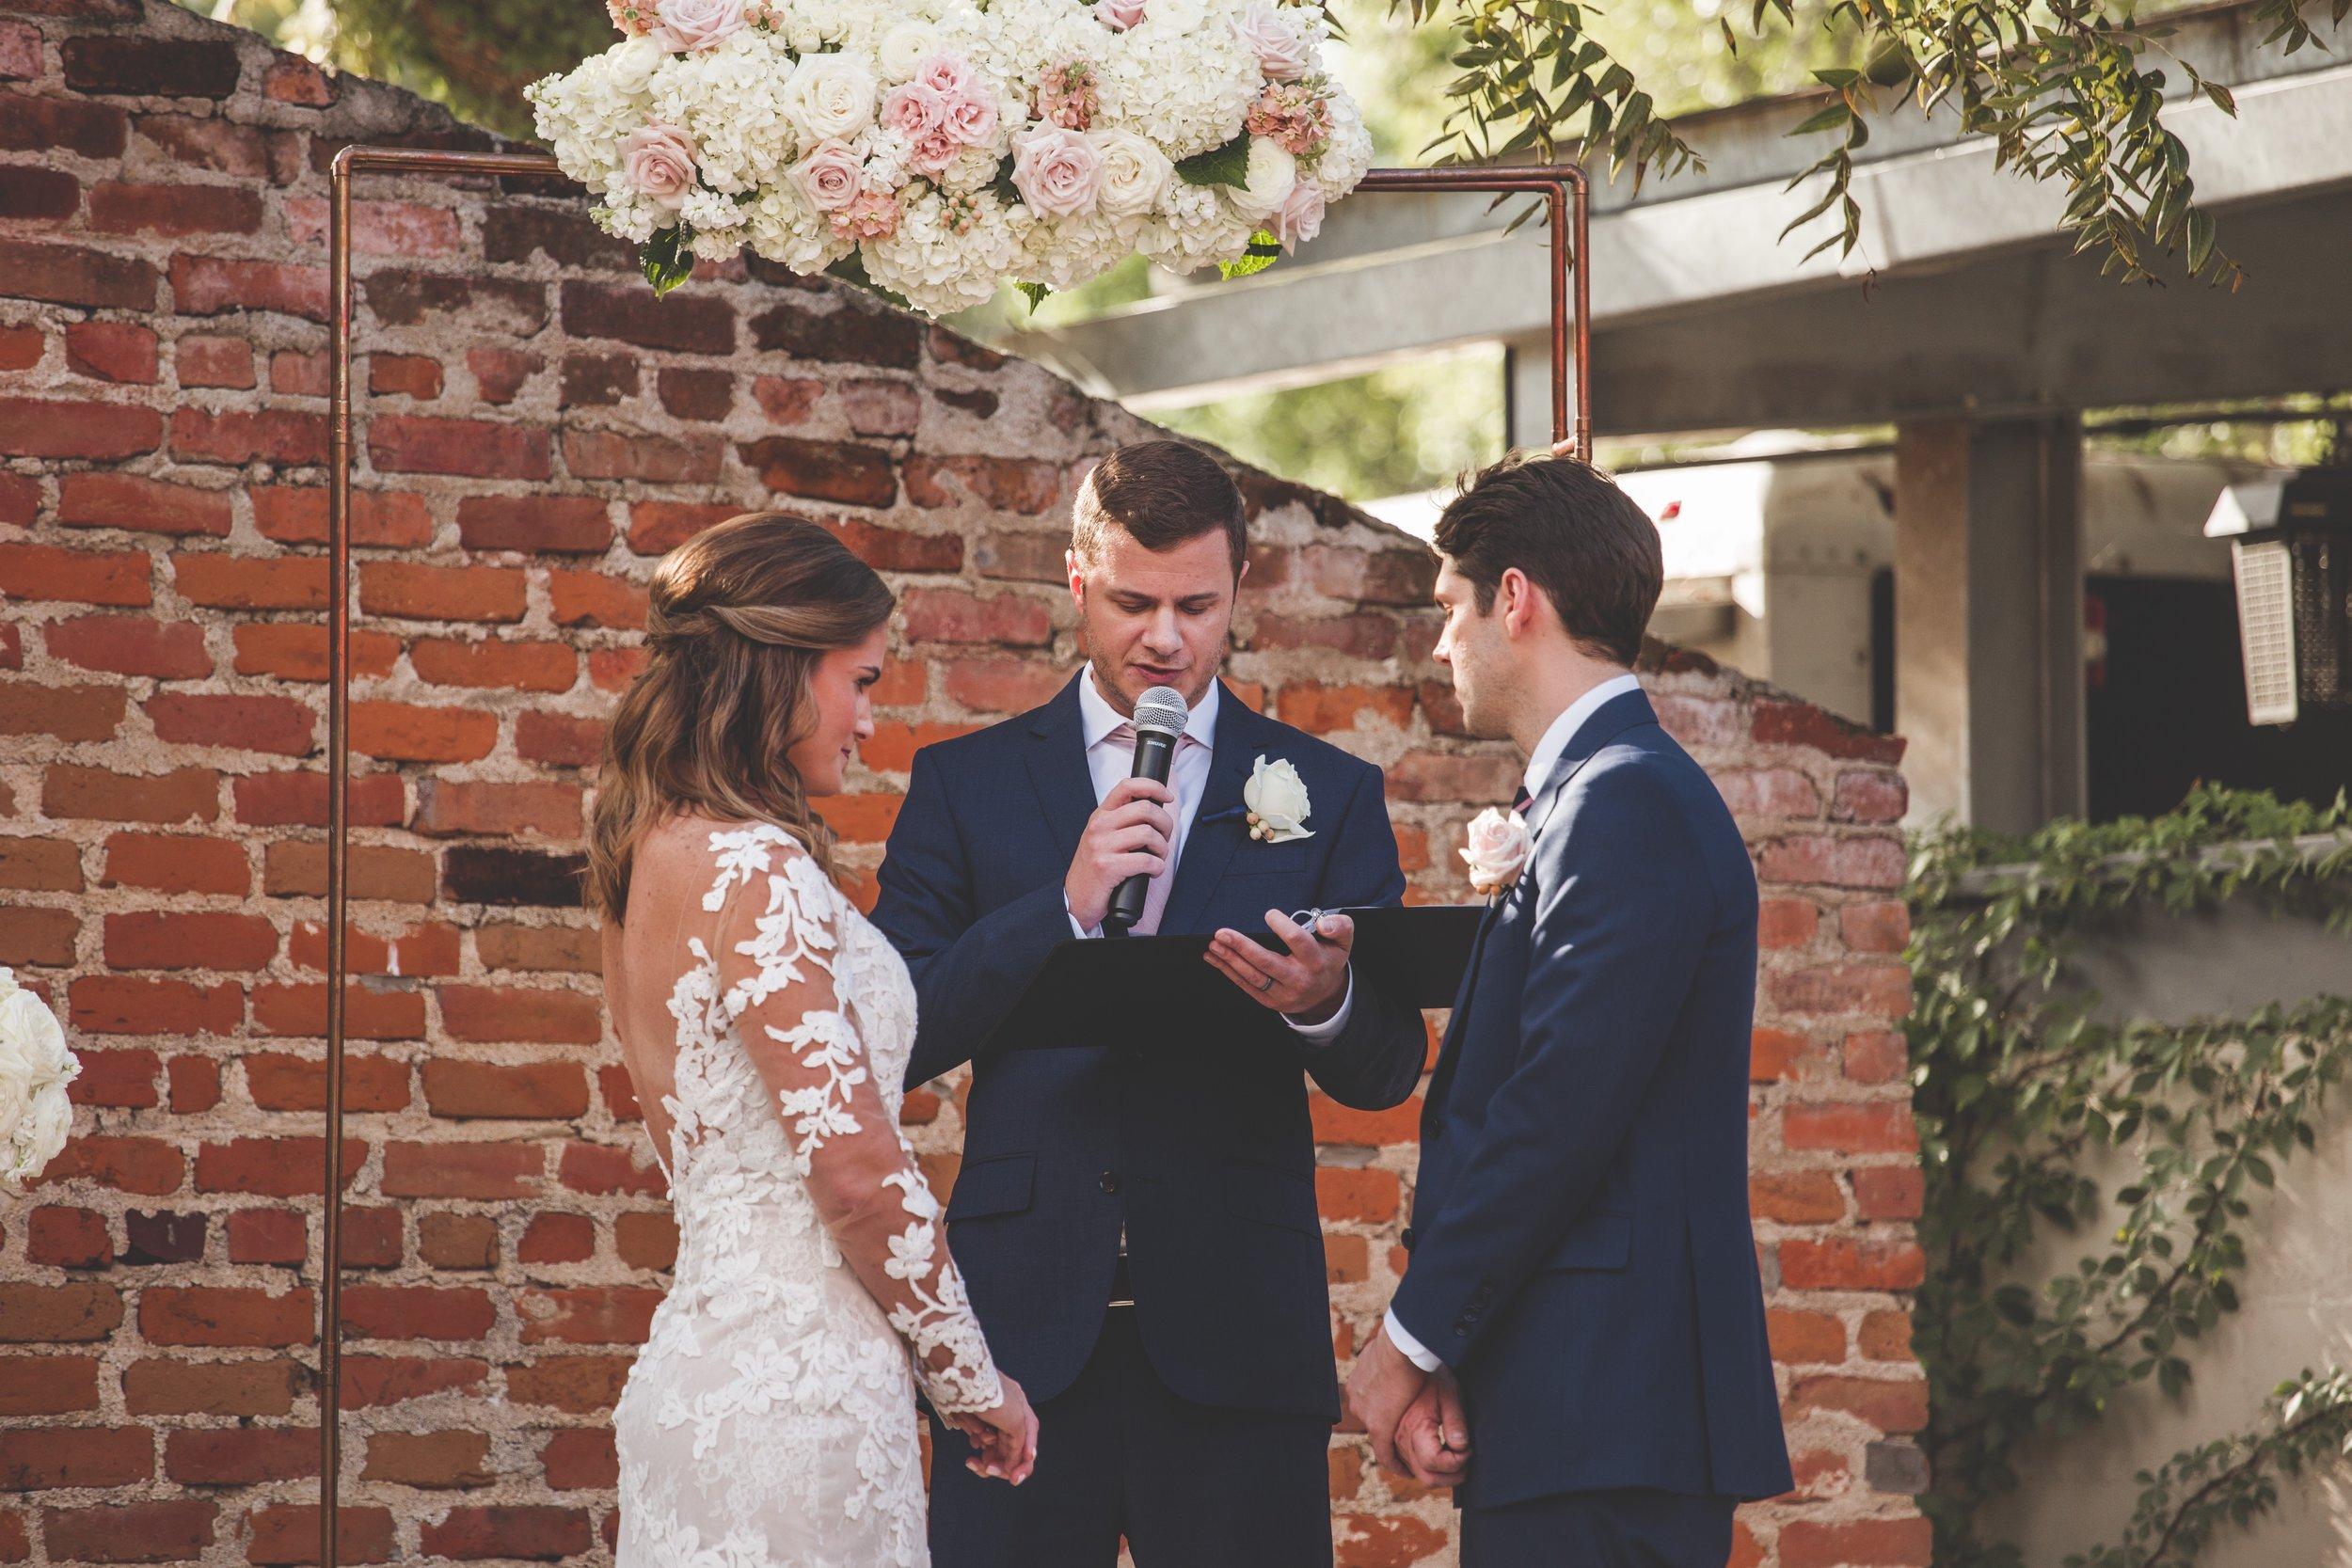 cider-gallery-lawrence-ks-wedding-photographer-jason-domingues-photography-lindsey-paul-0369.jpg